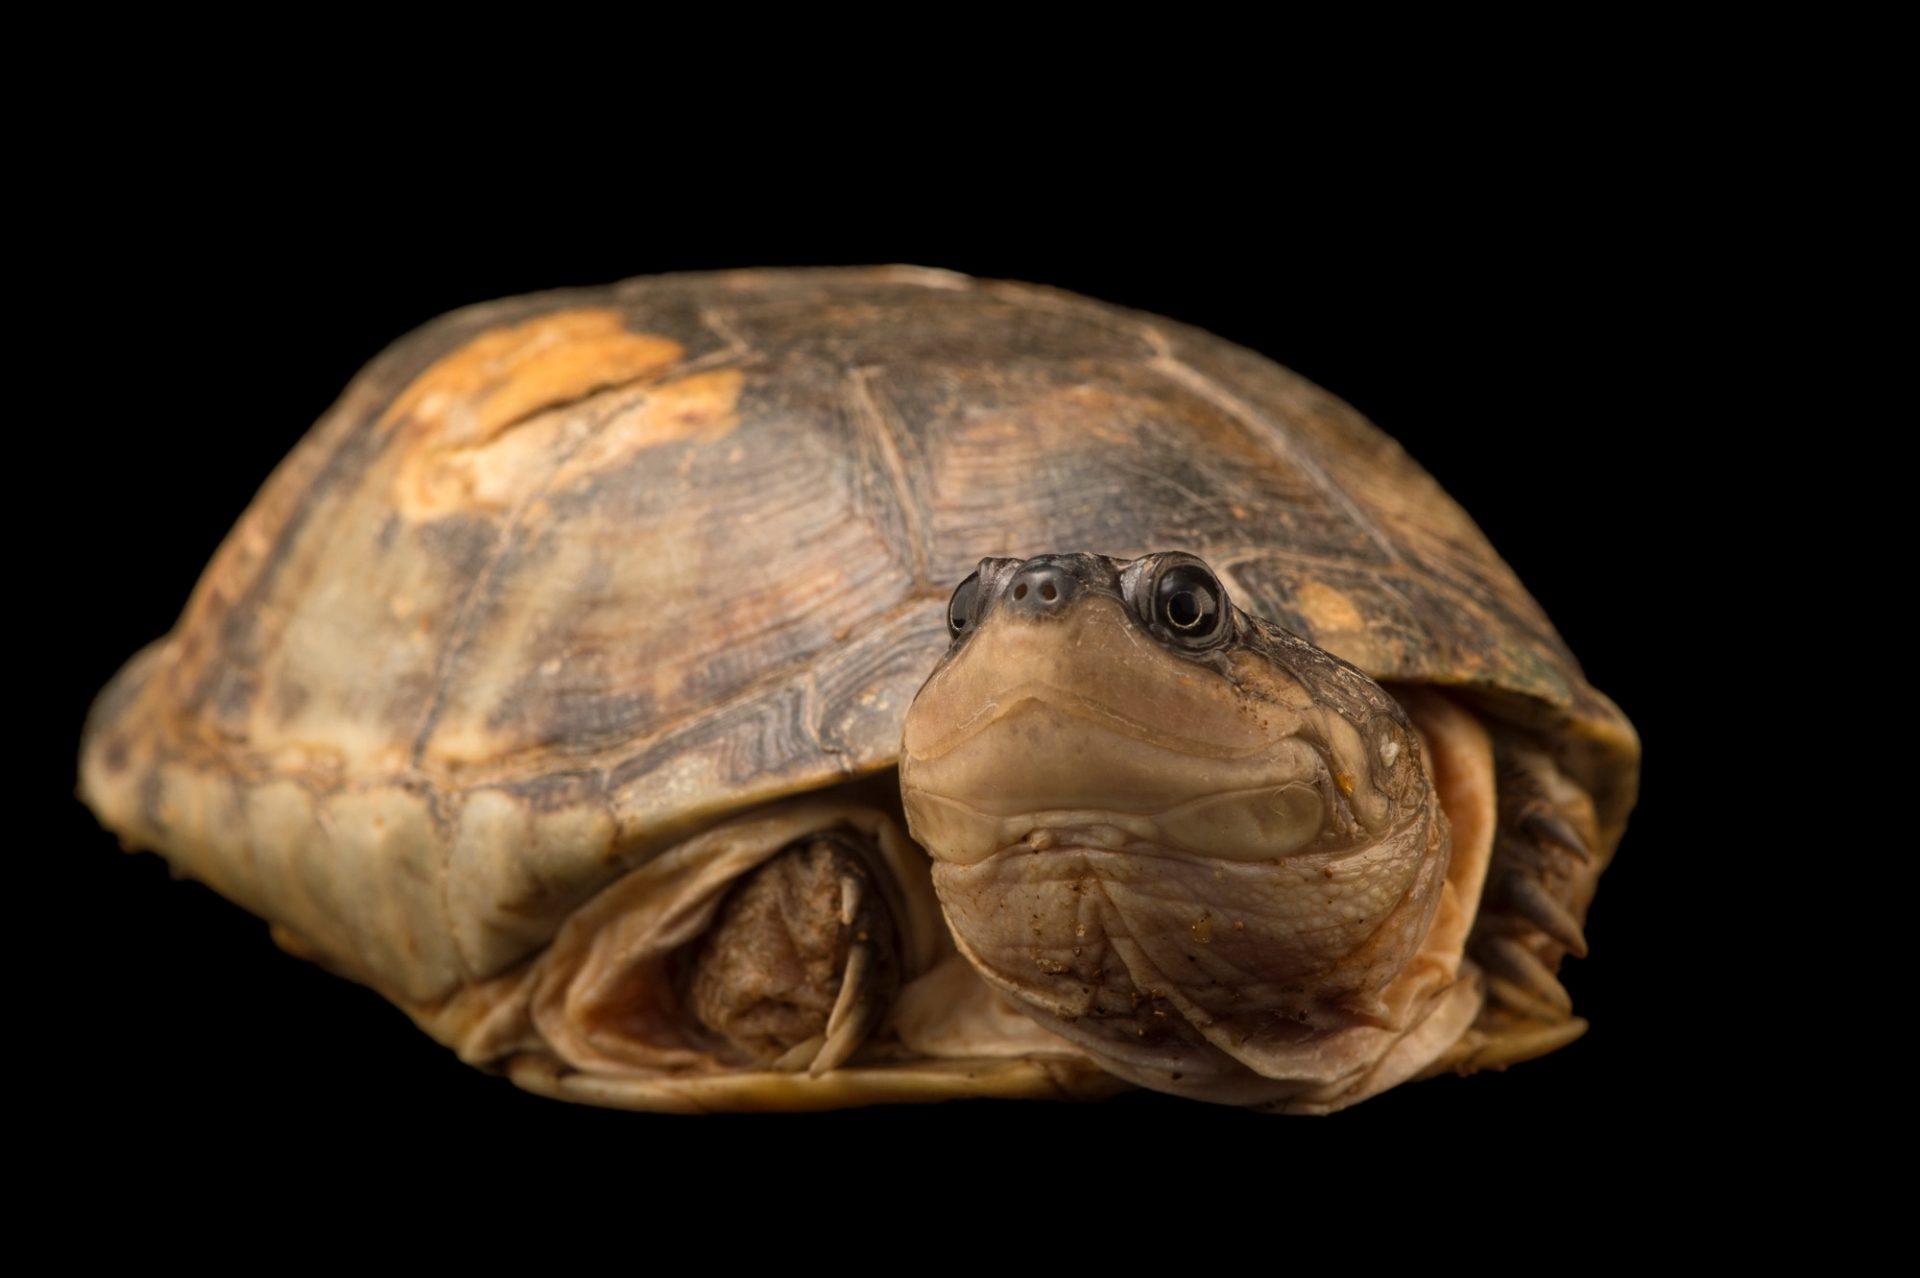 Photo: A yellow-bellied mud turtle, Pelusios castanoides, at Tsimbazaza Zoo.